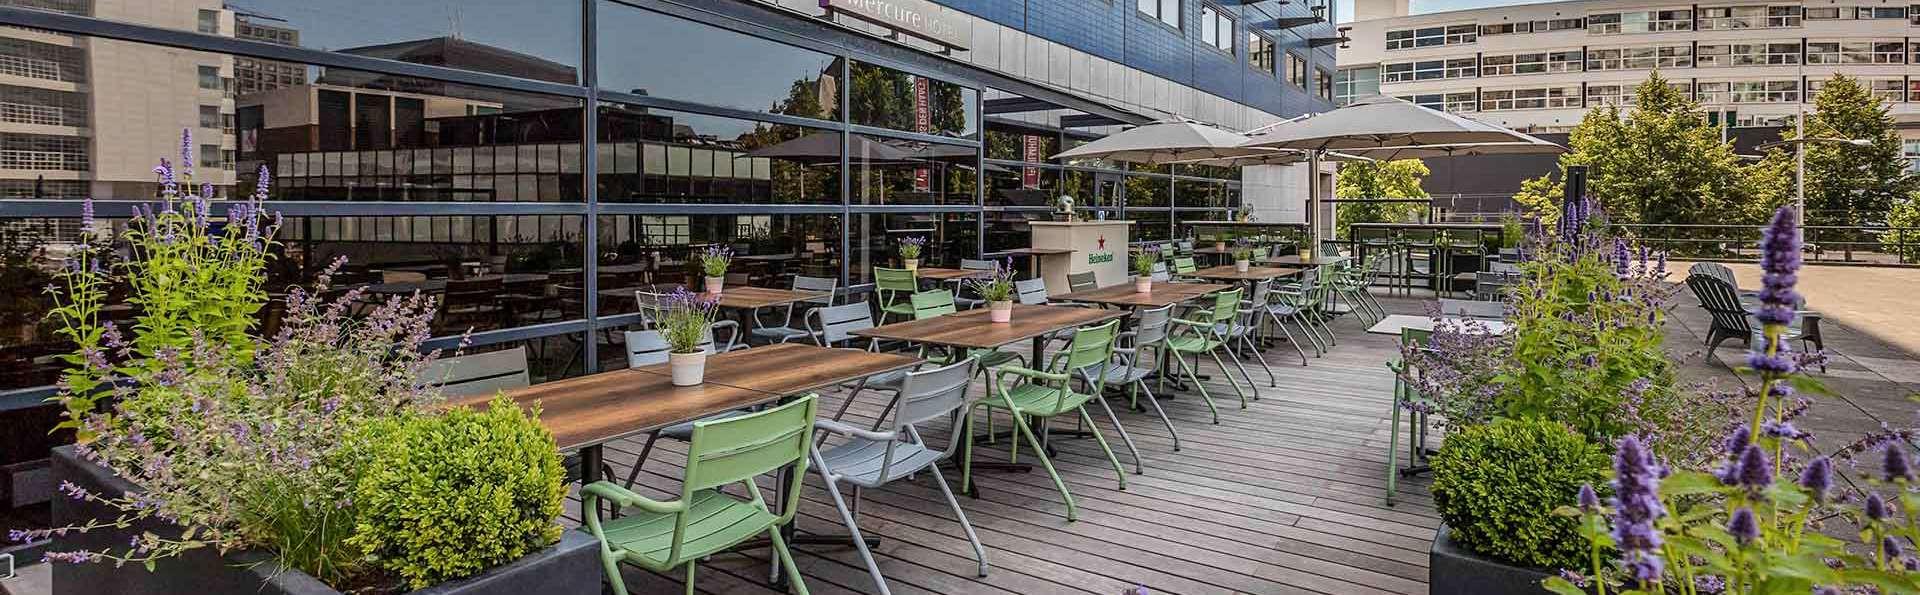 Mercure Hotel Den Haag Central - EDIT_Terras_01.jpg